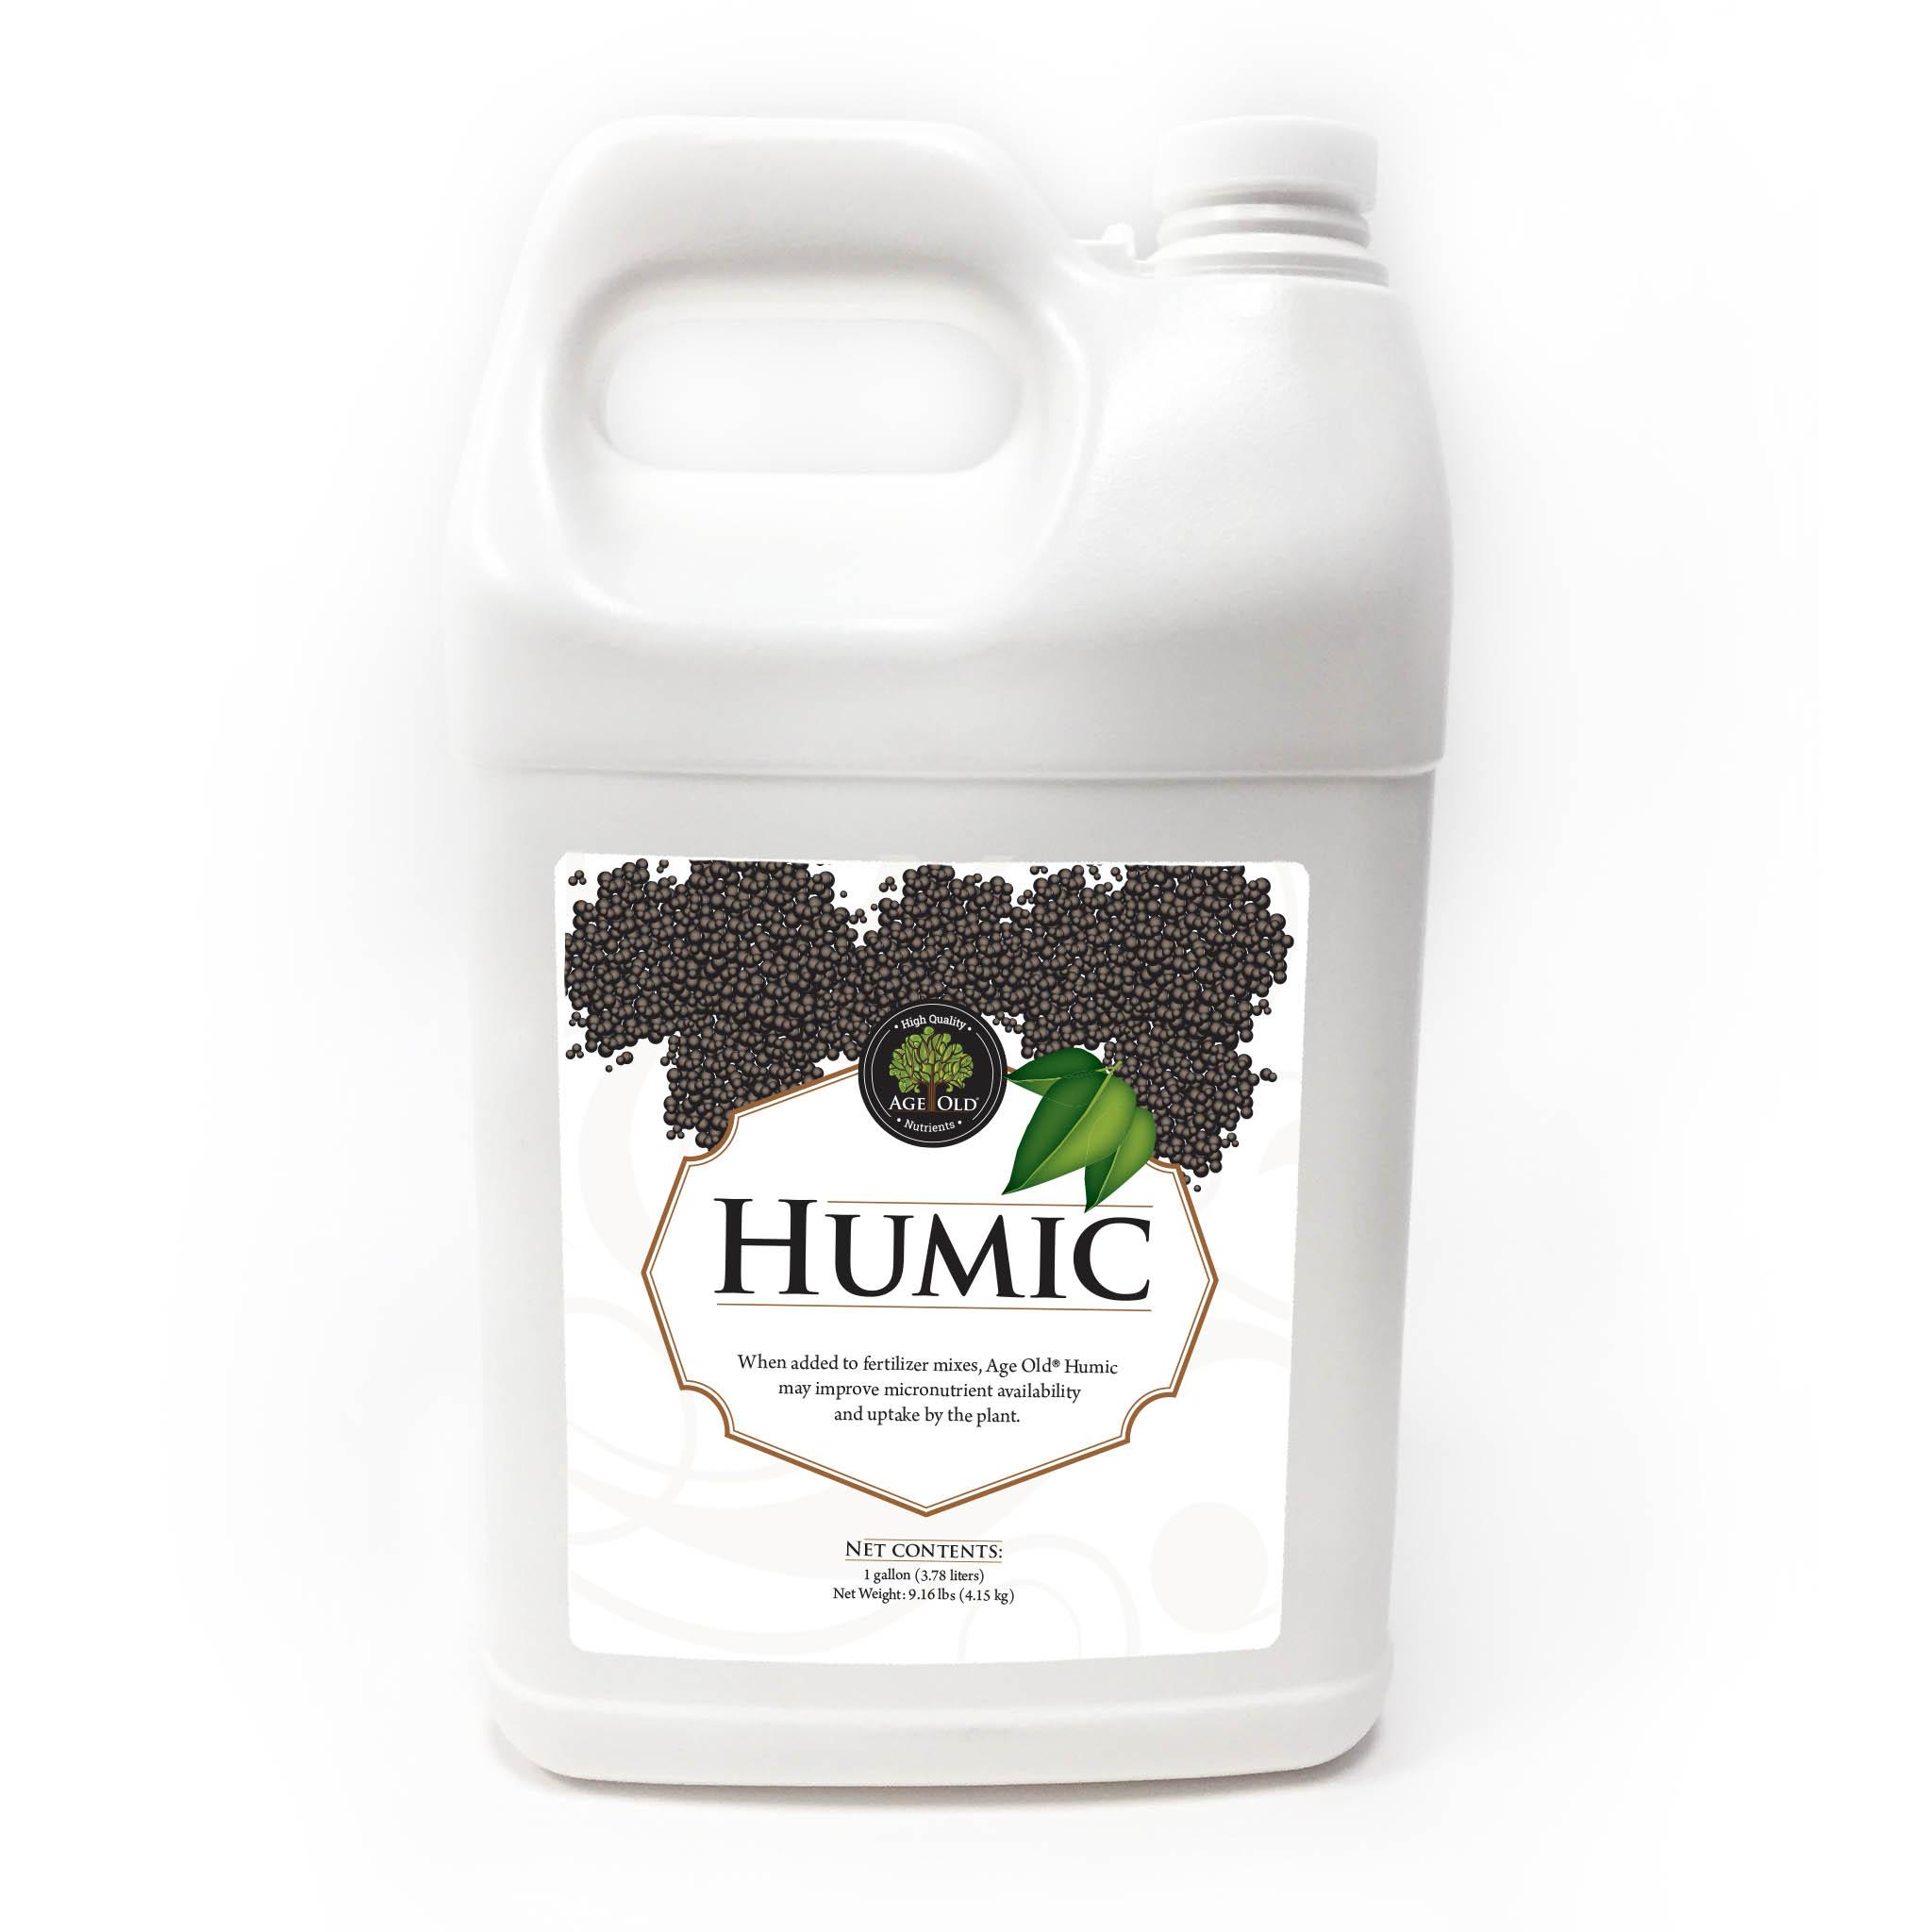 bottle of Humic